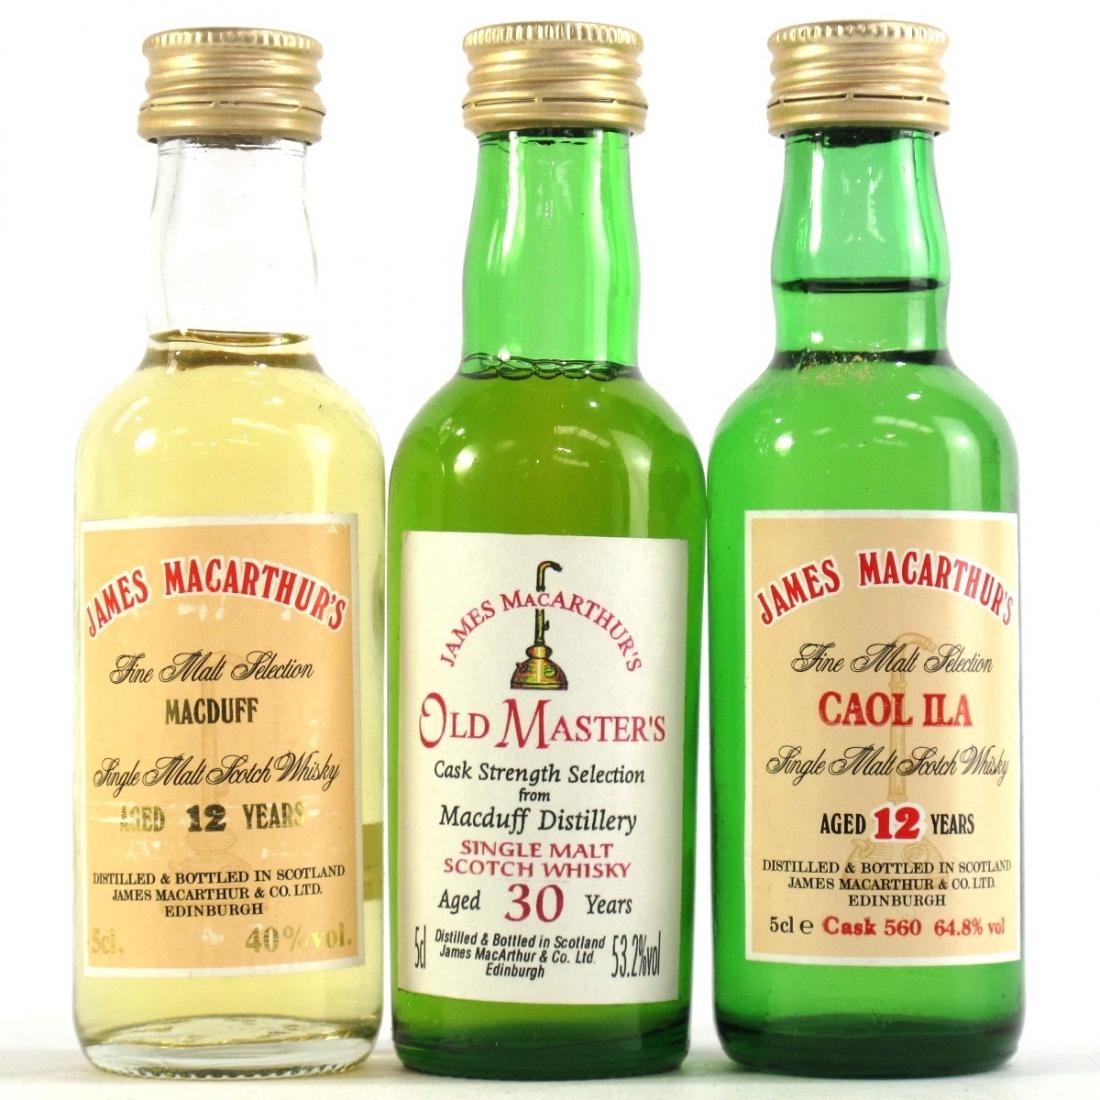 Caol Ila & Macduff James MacArthur Miniatures 3 x 5cl